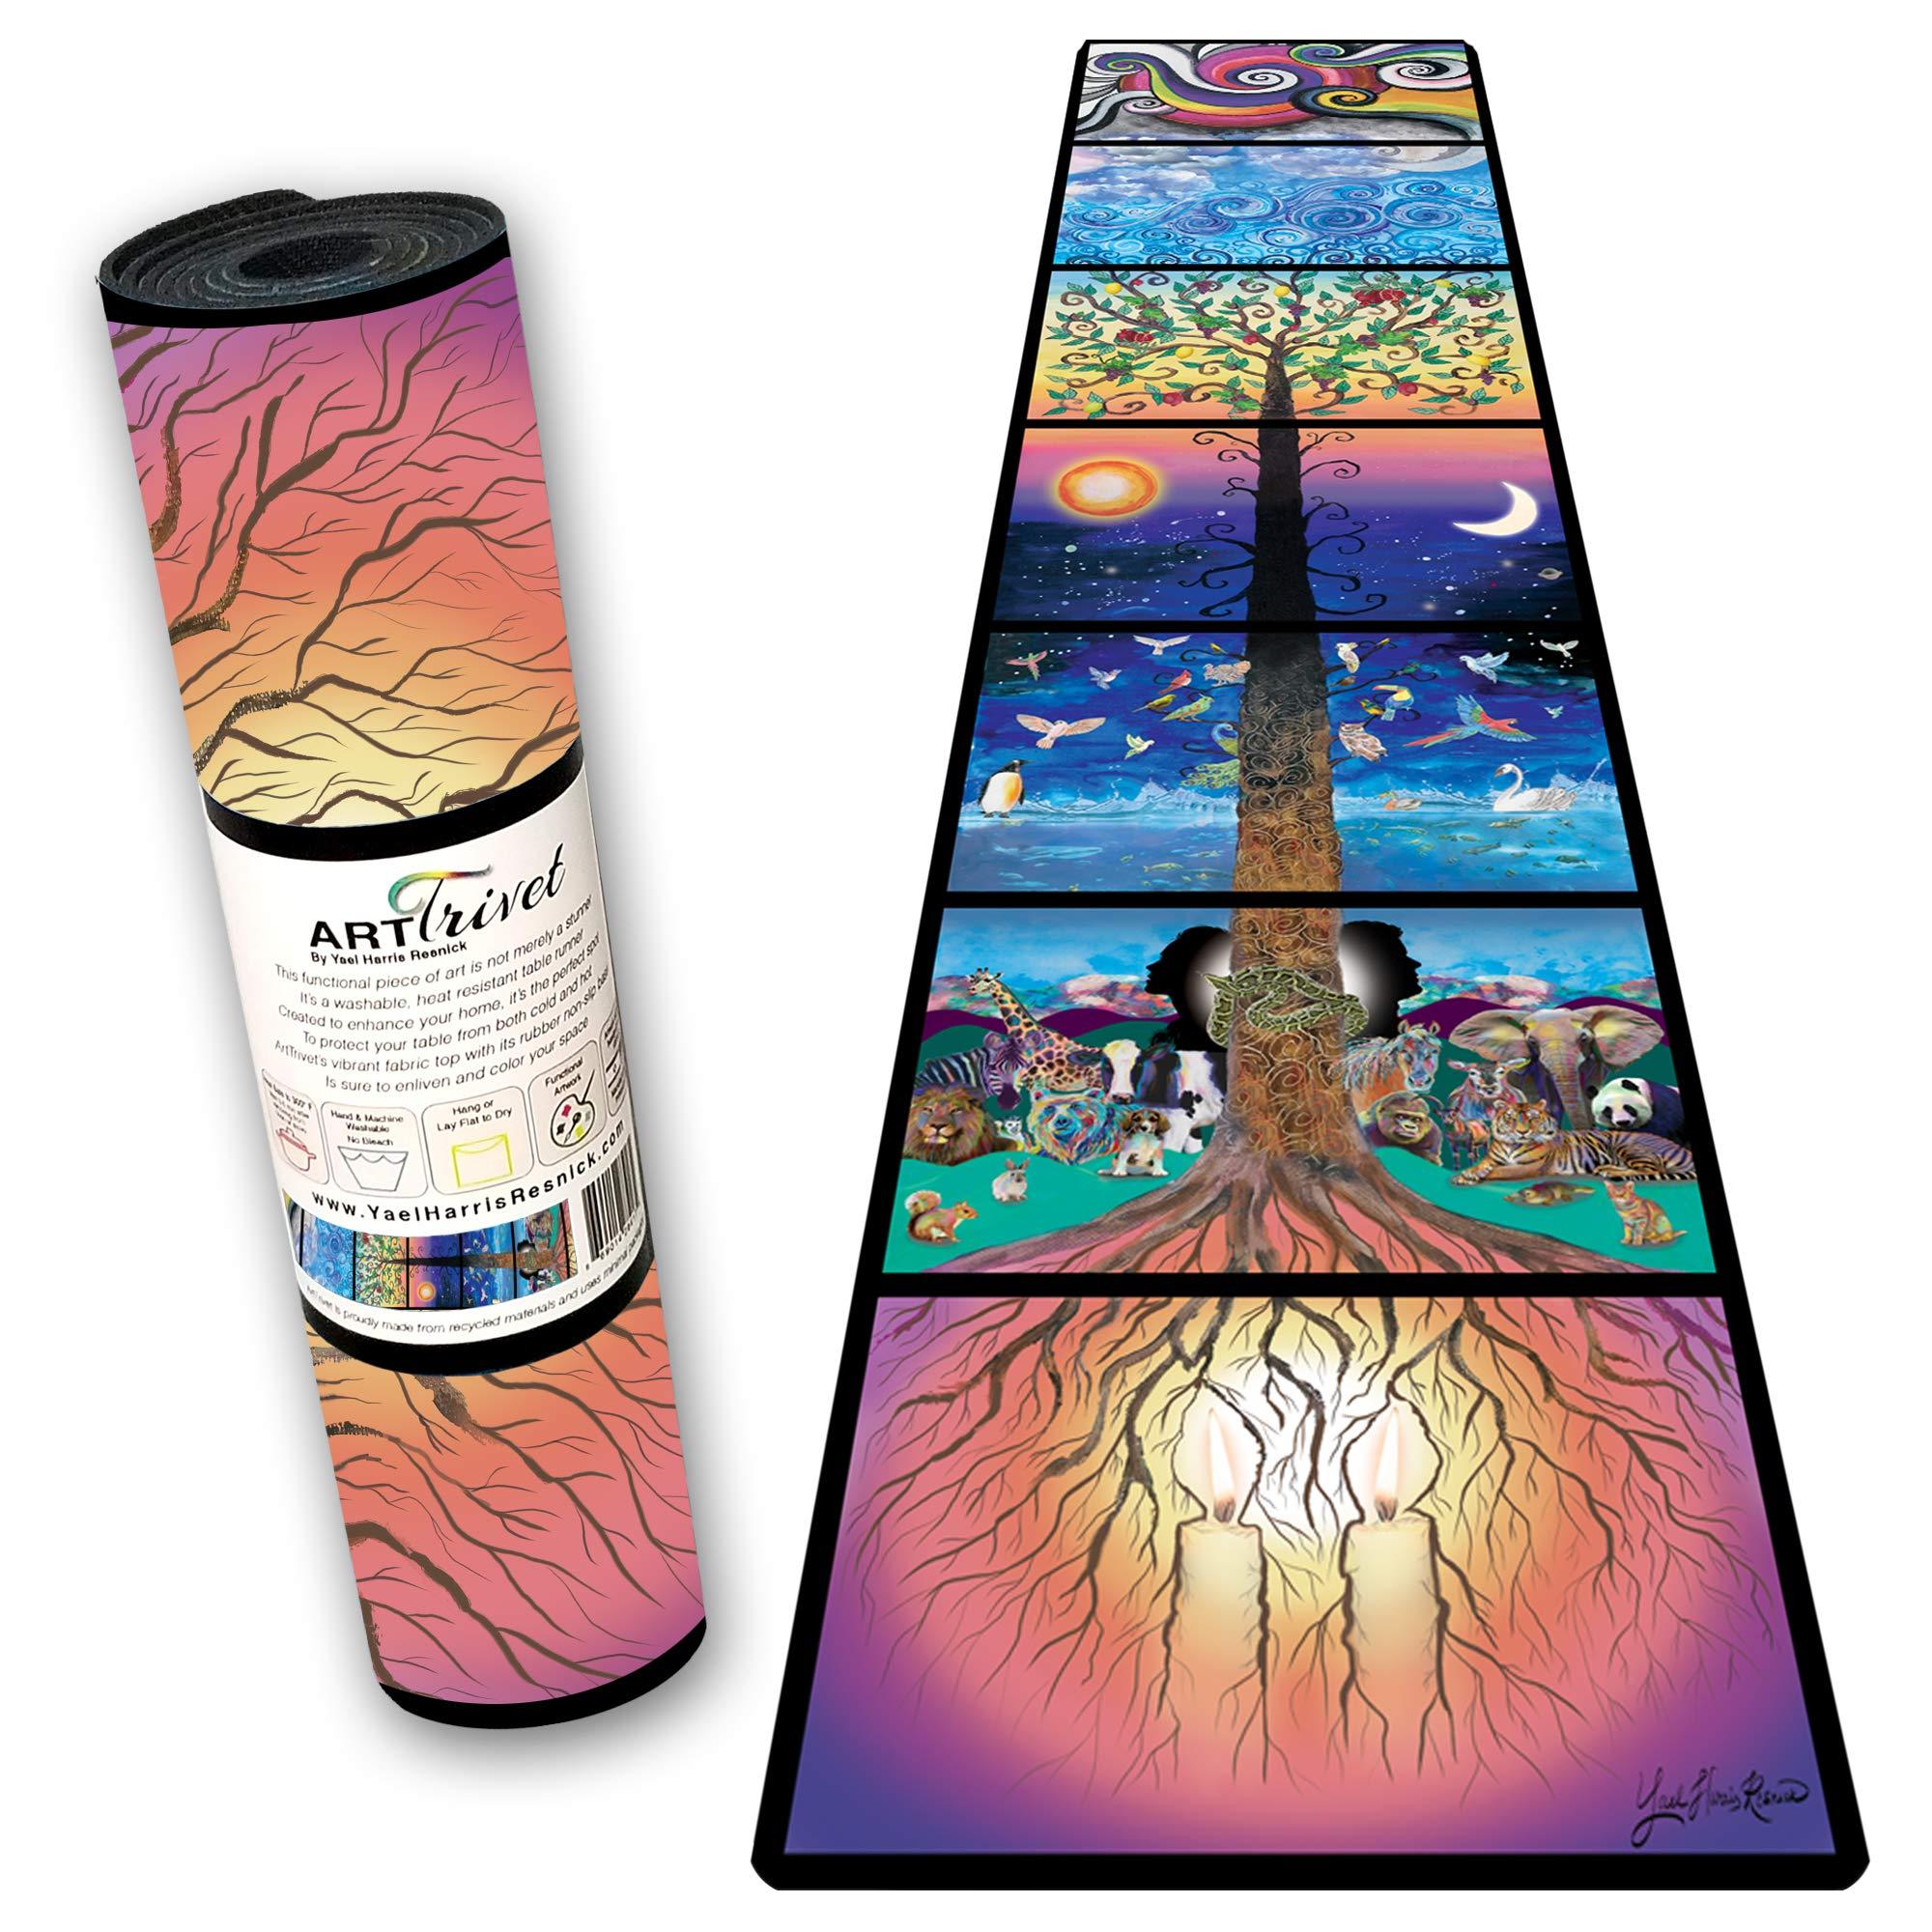 Creation ArtTrivet heat-resistant table runner and trivet - fabric top and non-slip rubber base (12''x48'') by ArtTrivet